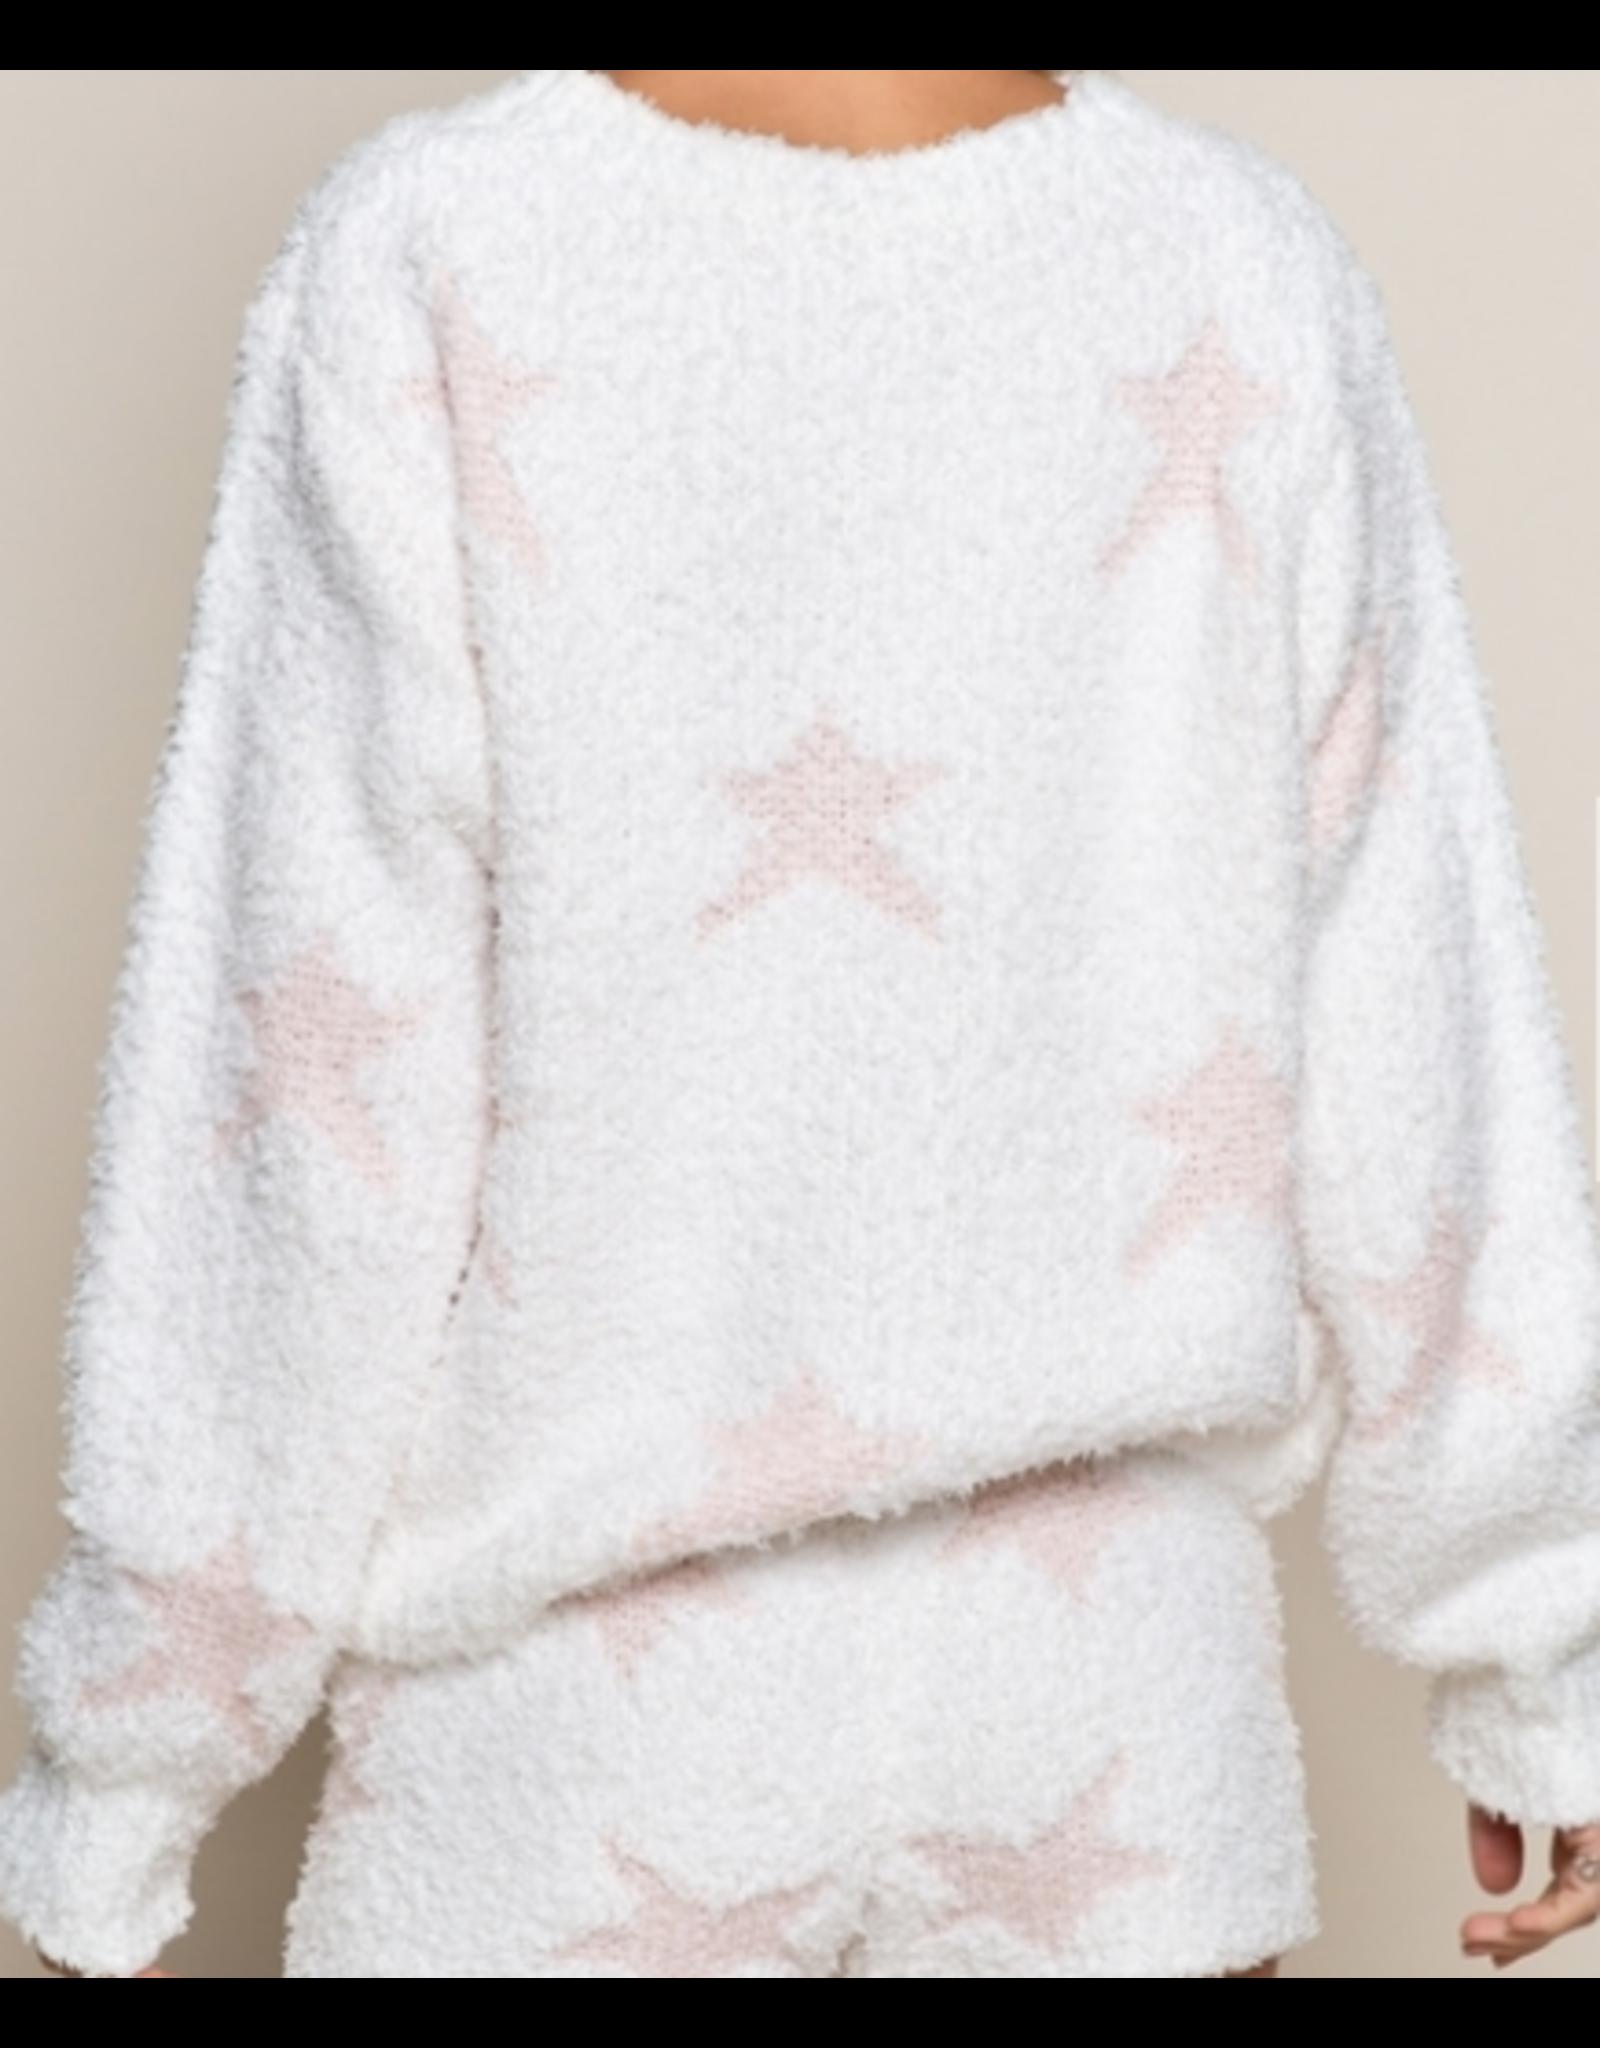 Dazzling Starlight Sweater, White with Pink Stars